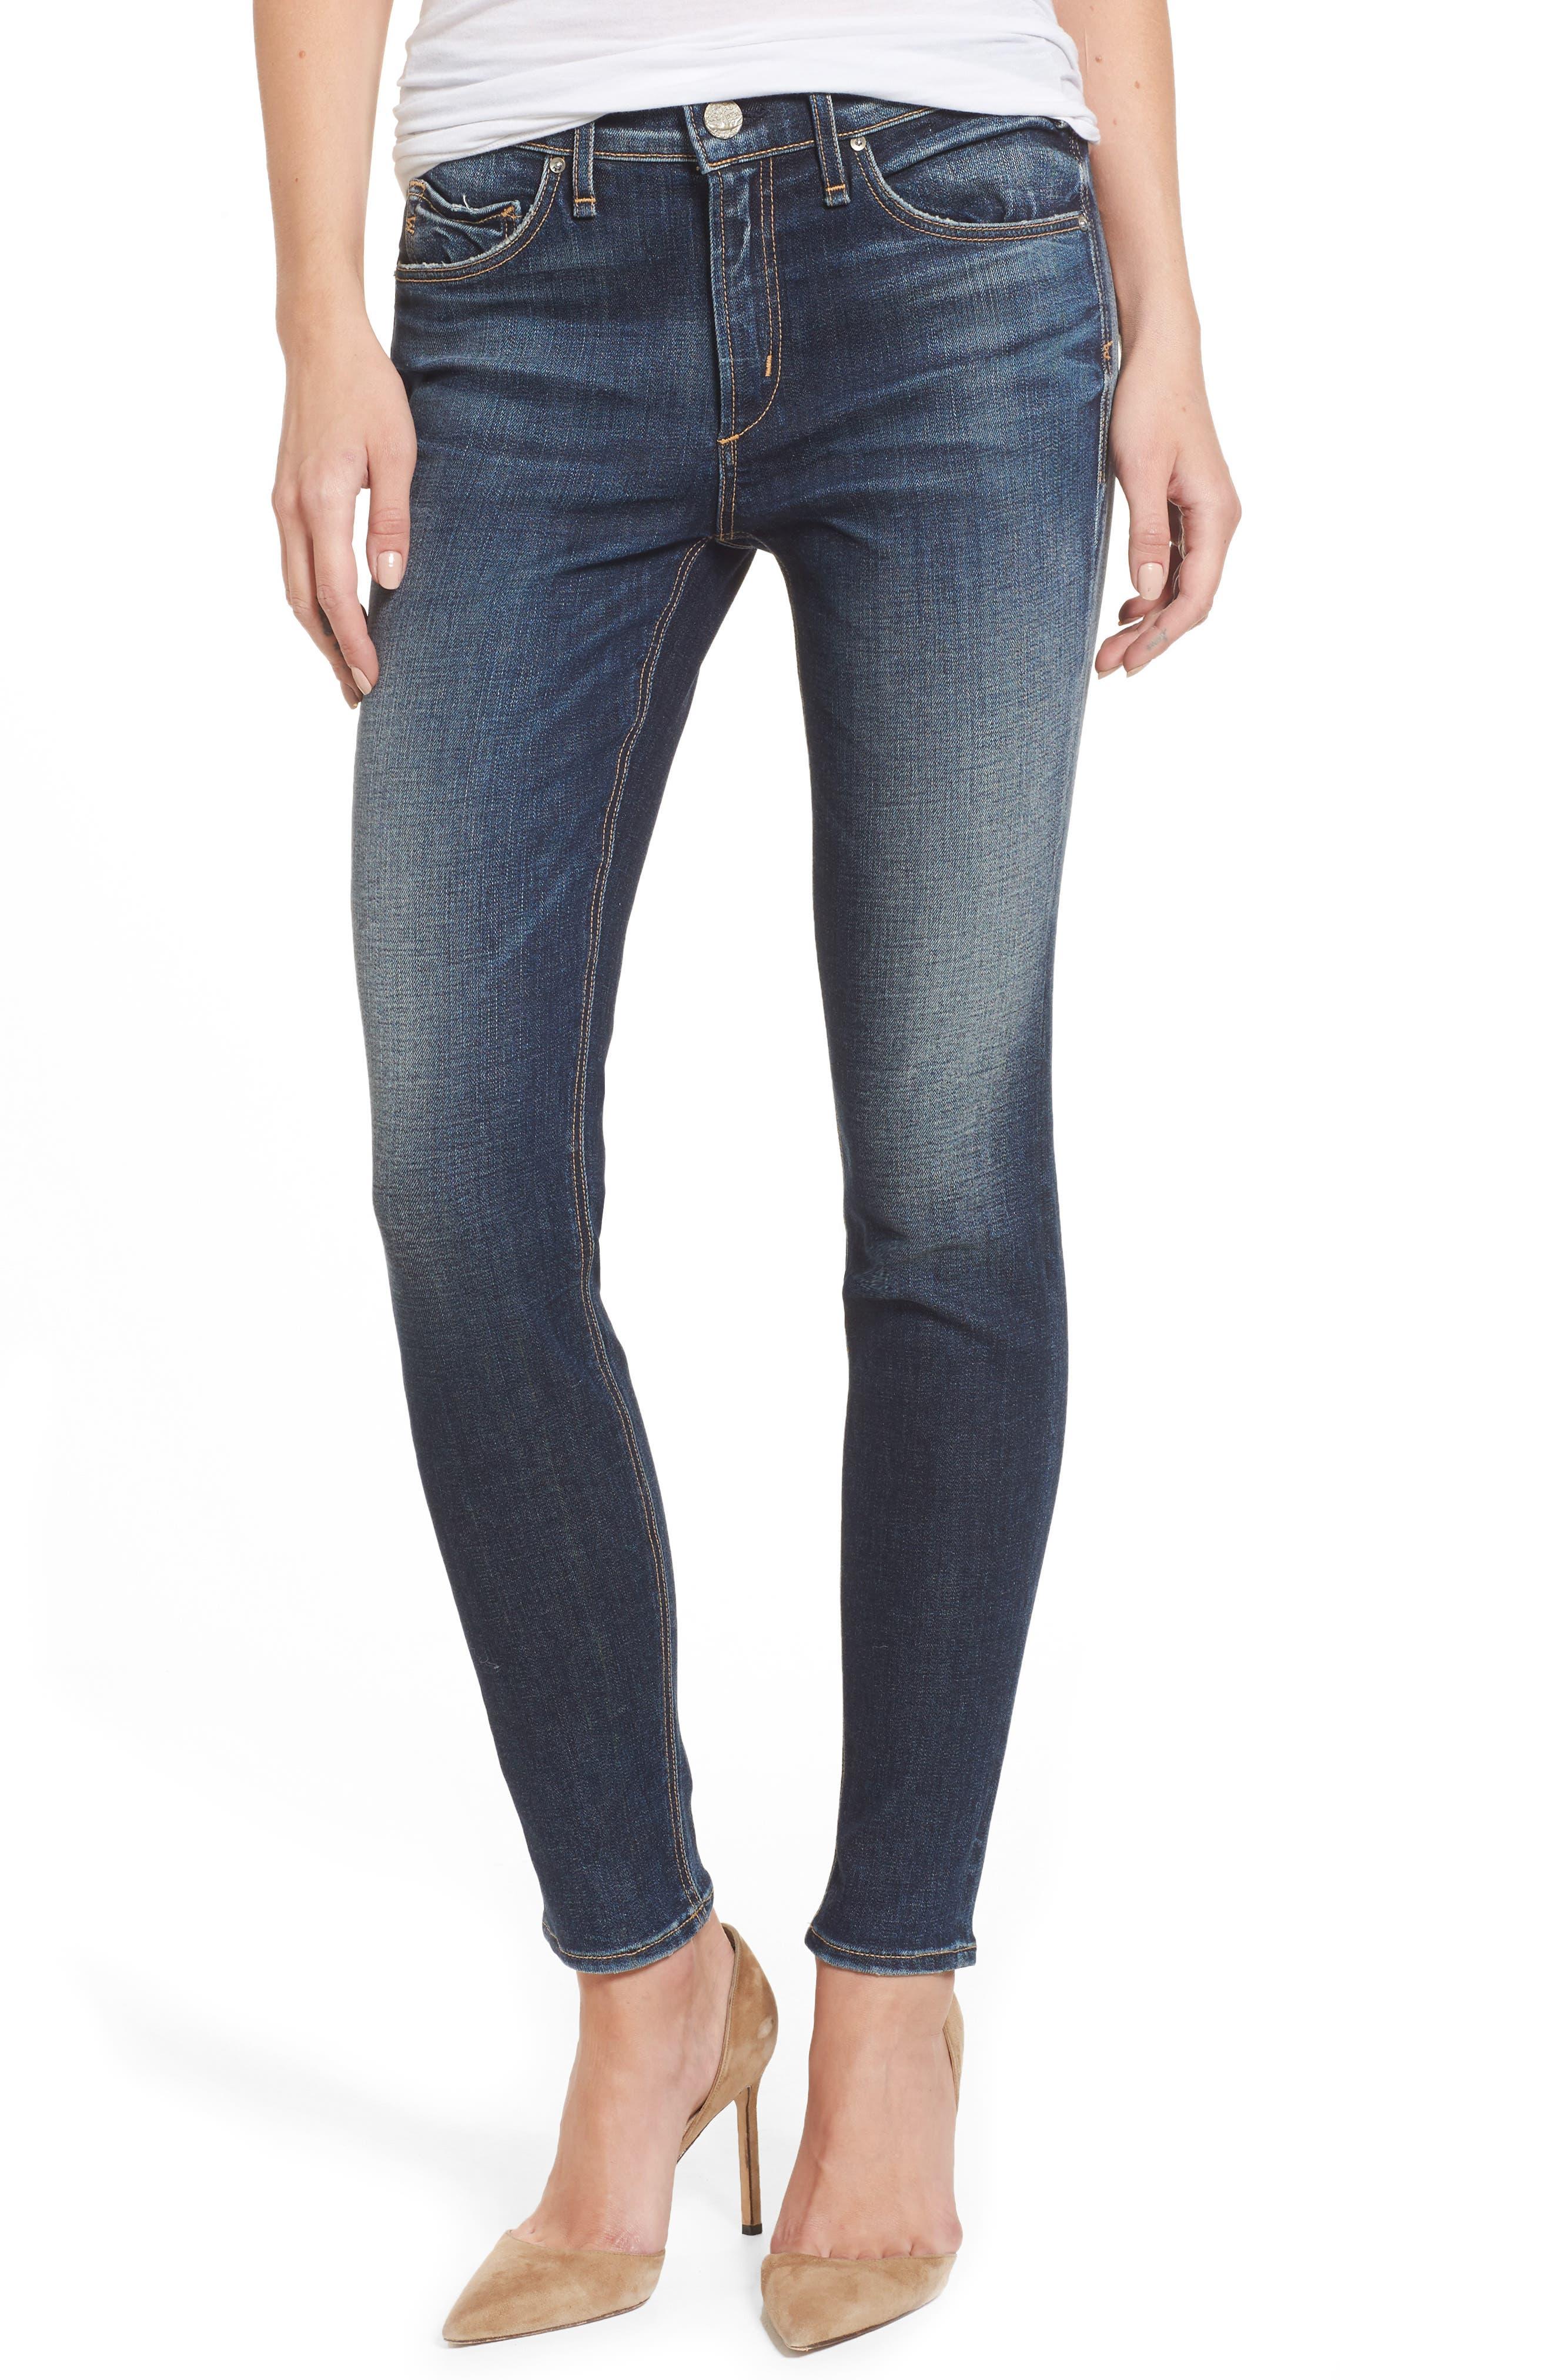 Newton High Waist Skinny Jeans,                         Main,                         color, One Thousand Suns